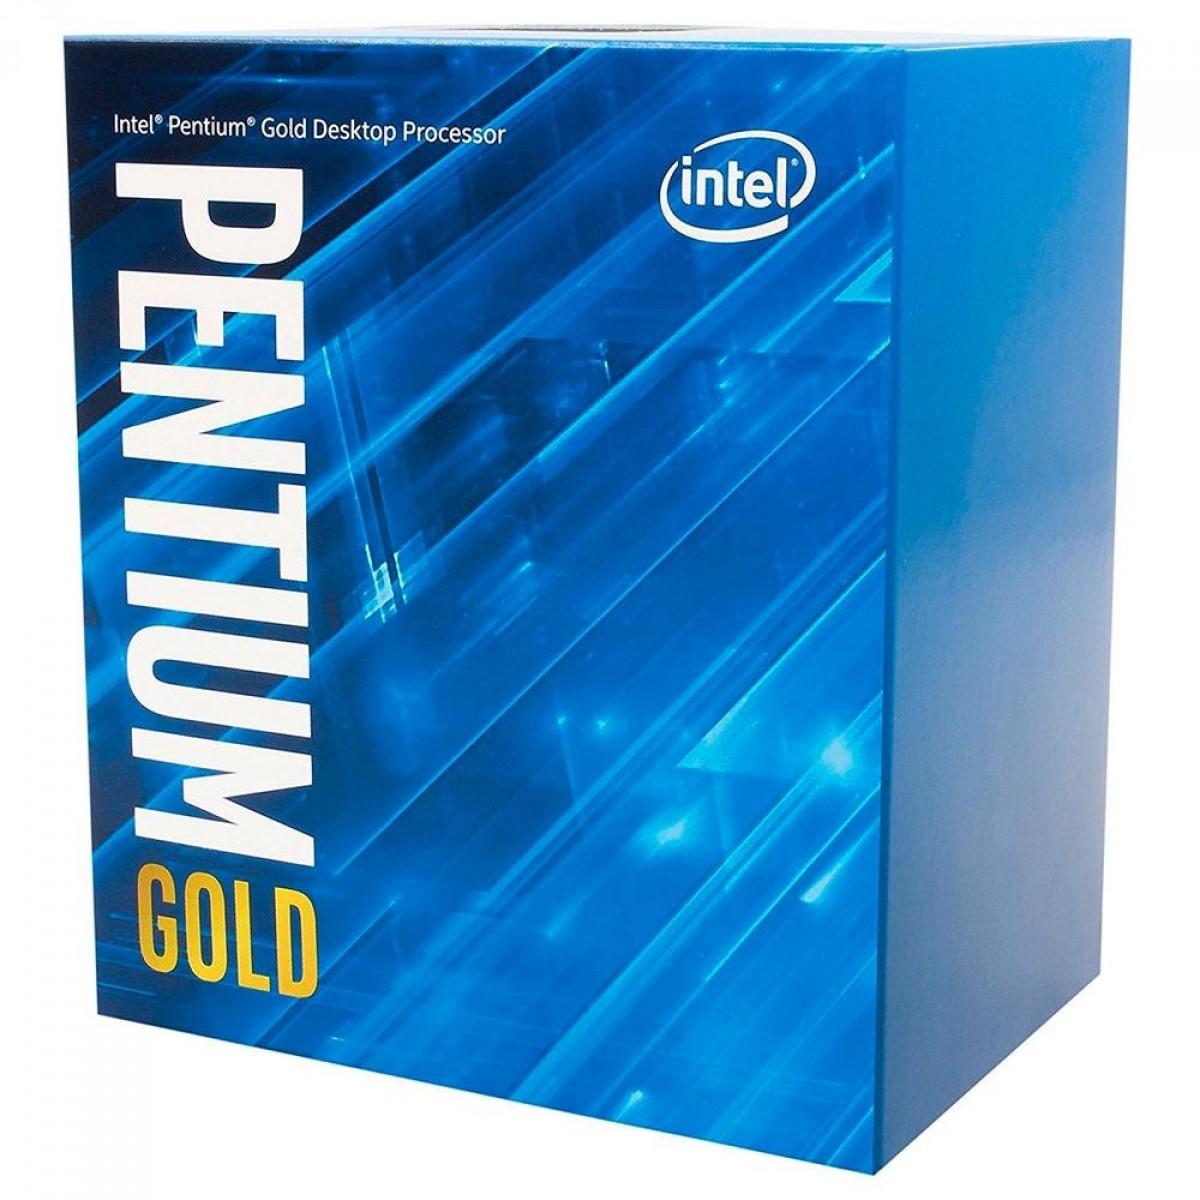 Processador Intel Pentium Gold G6400, 4.0GHz, 2-Cores 4-Threads, LGA 1200, BX80701G6400